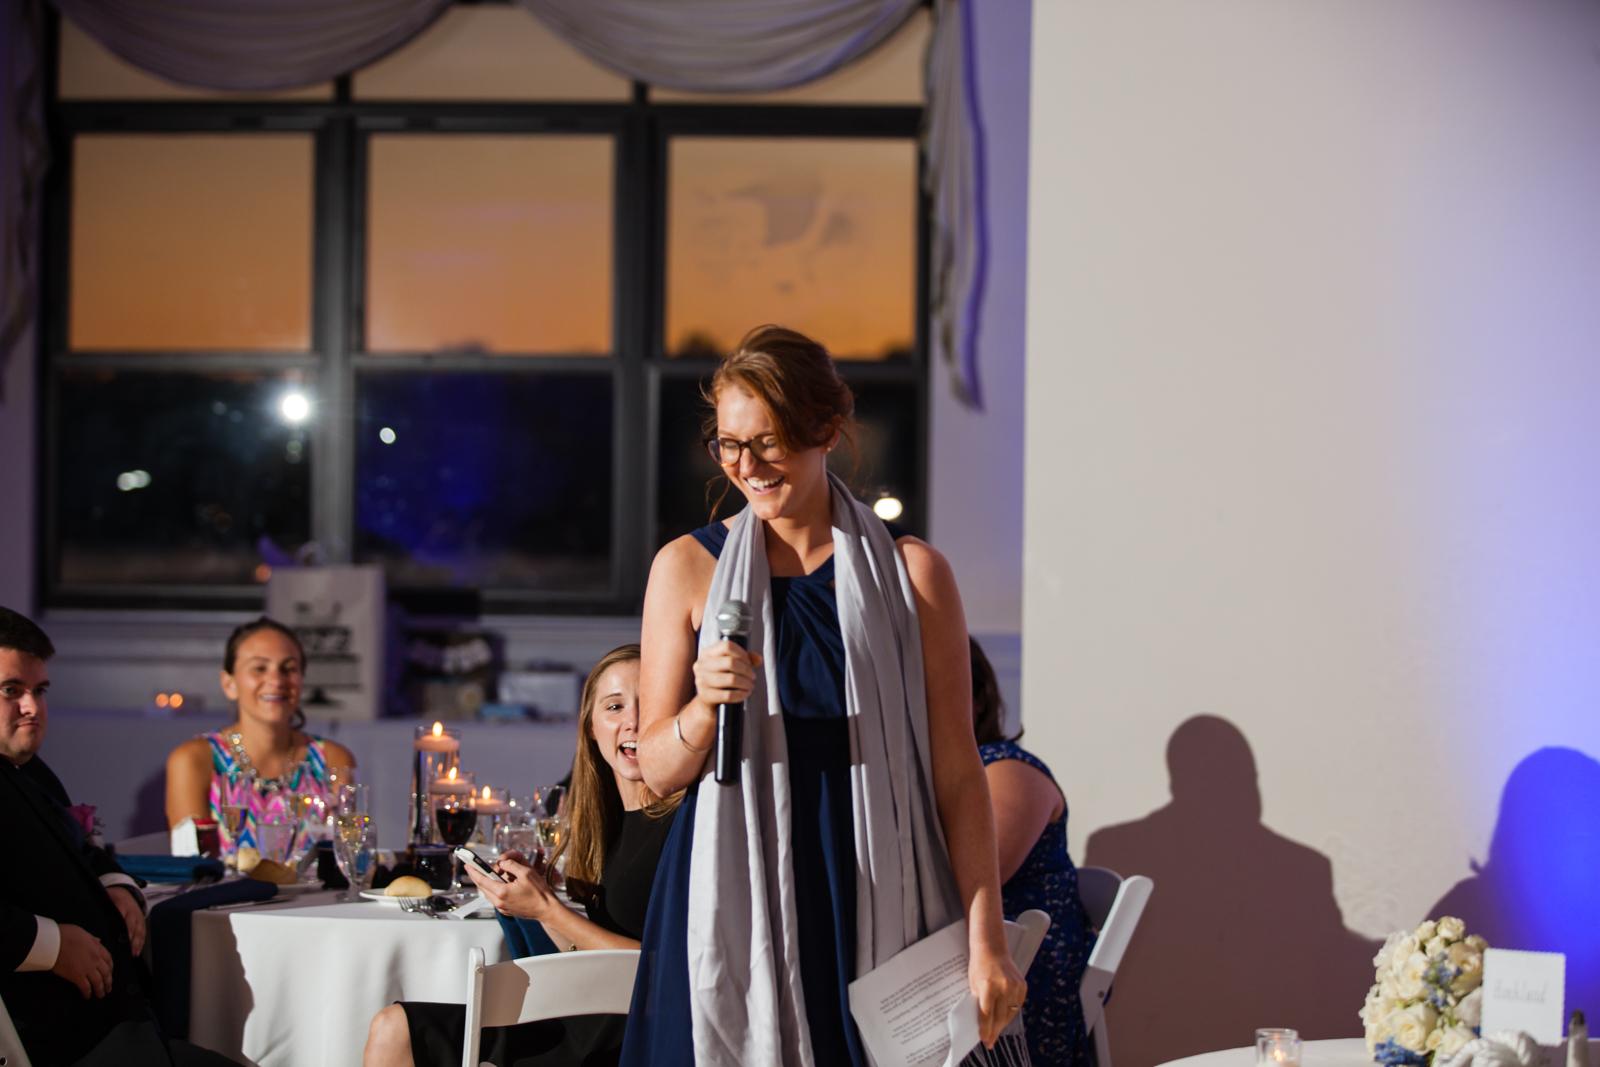 Eastons-Beach-Rotunda-Ballroom-Wedding-Newport-Rhode-Island-PhotographybyAmandaMorgan-105.jpg